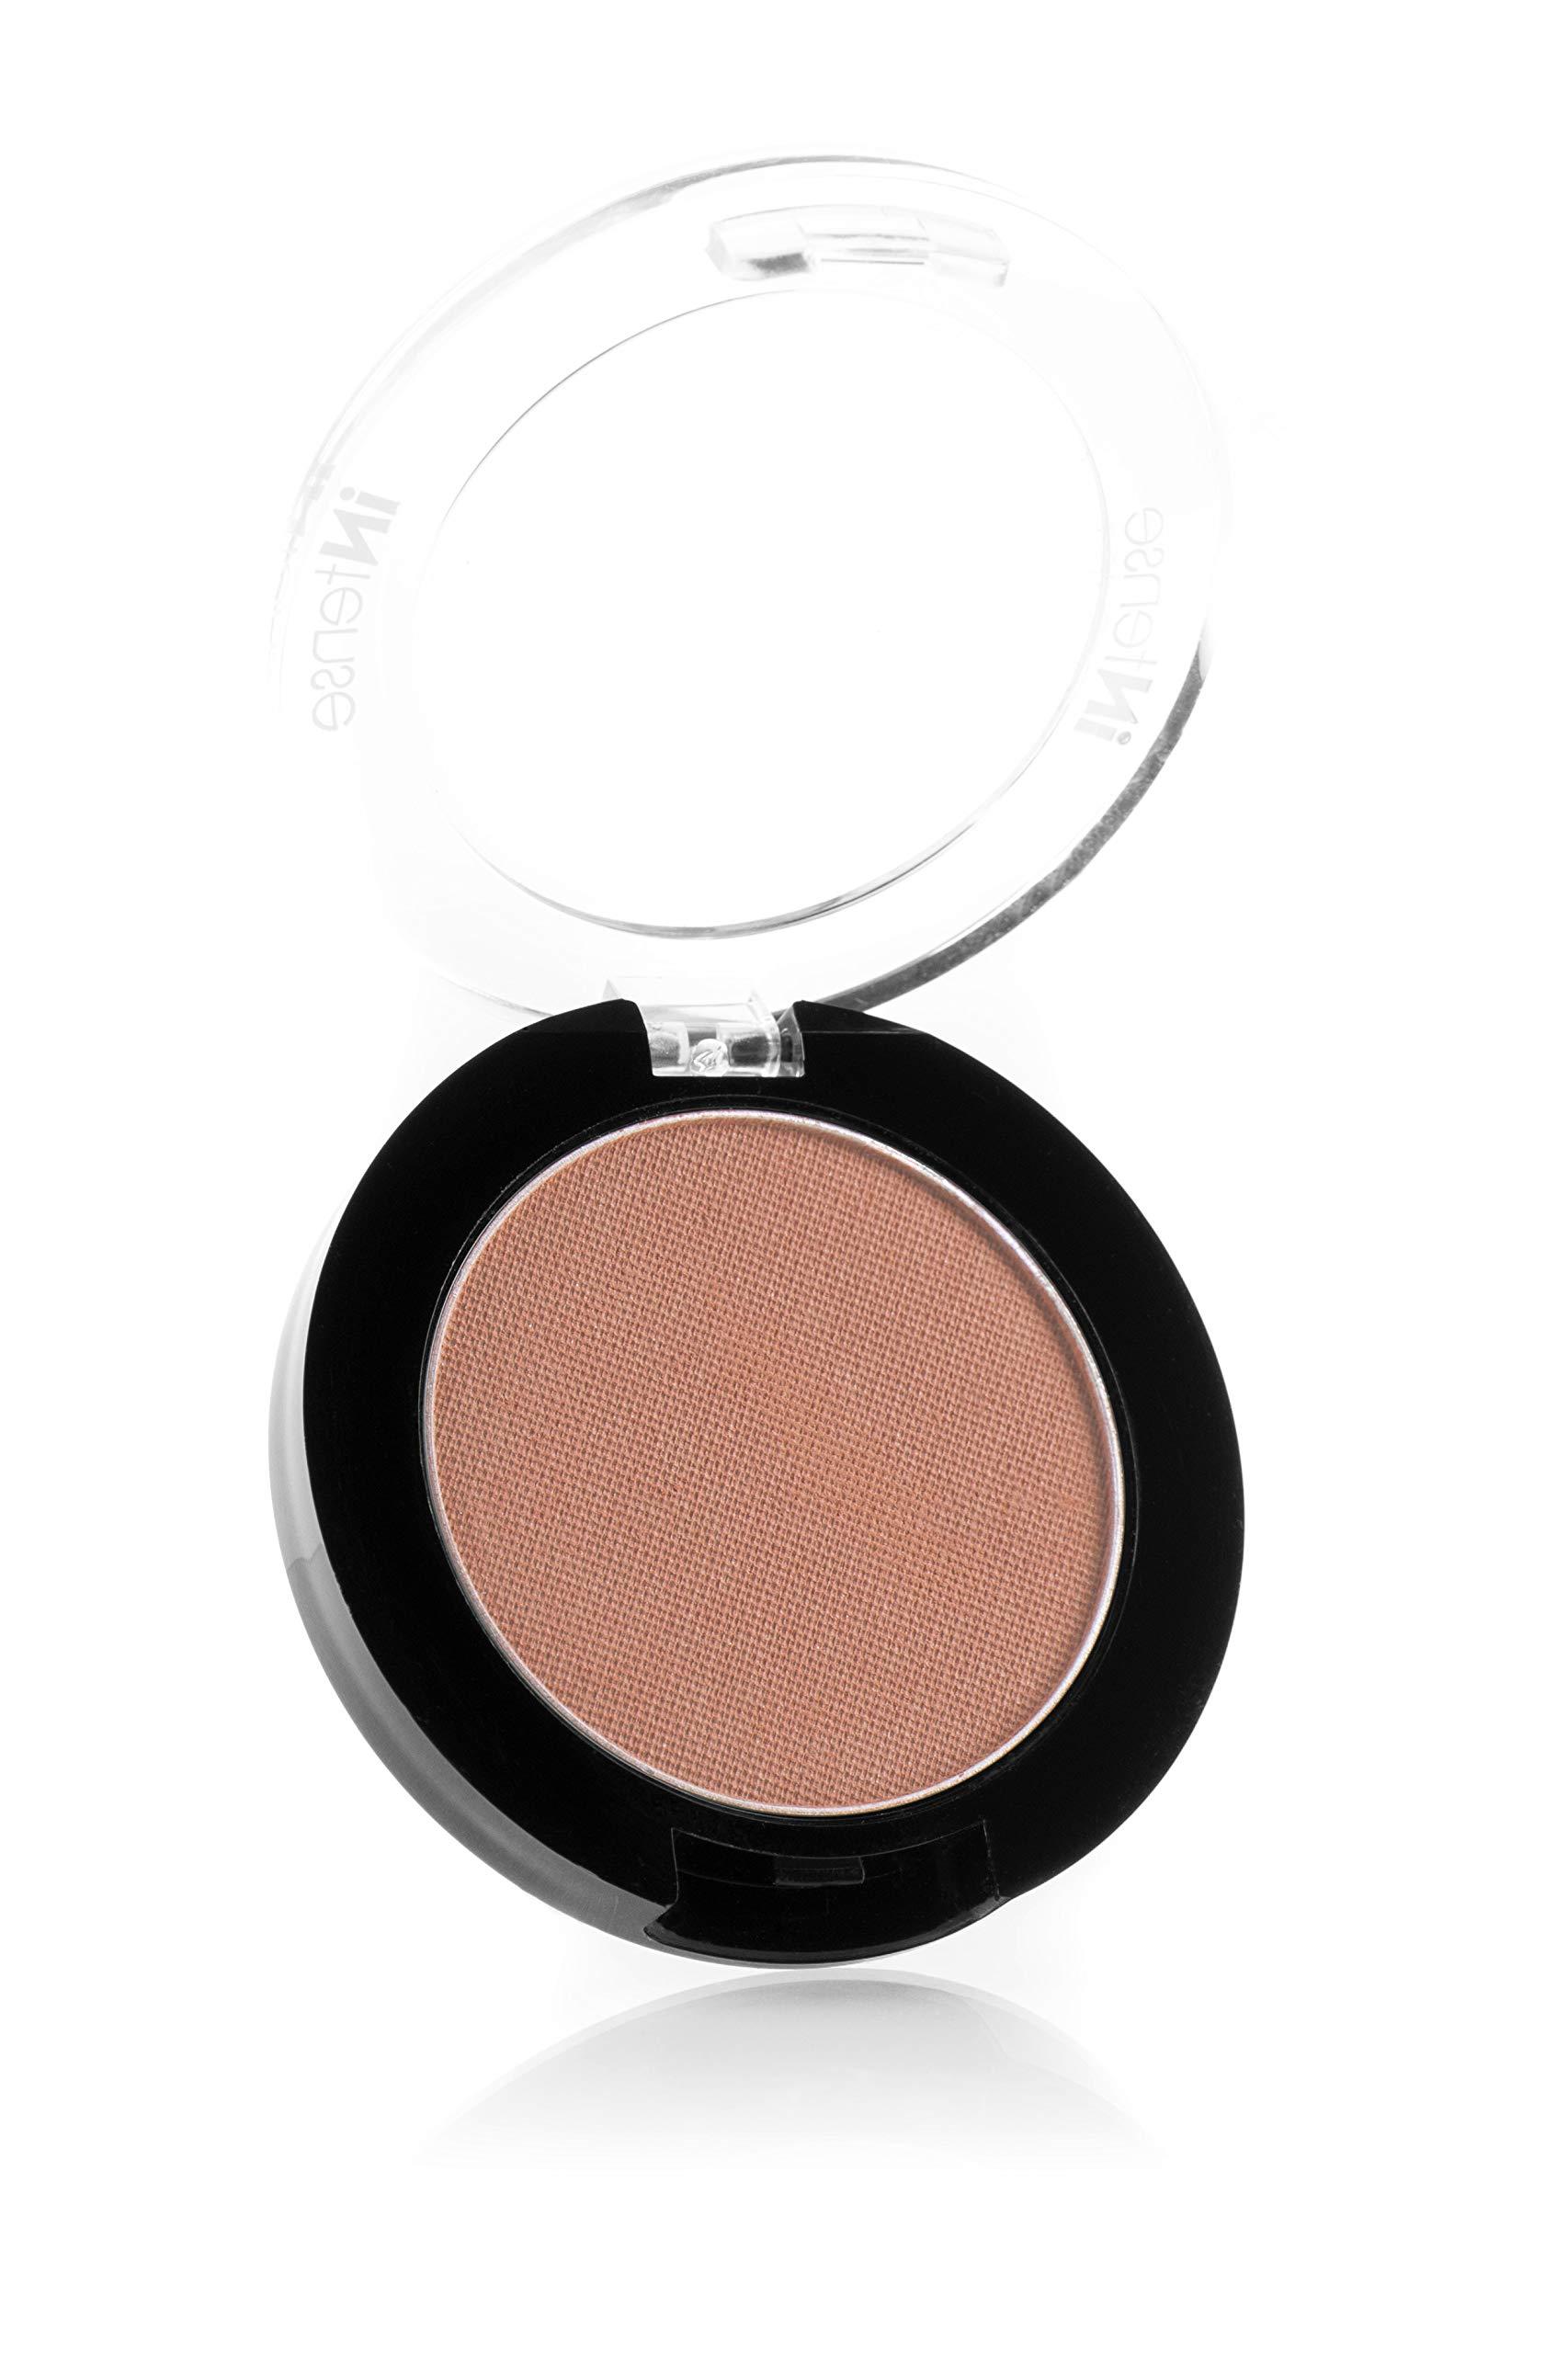 Mehron Makeup iNtense Pro Pressed Powder (.11 ounce) (Desert Sand)